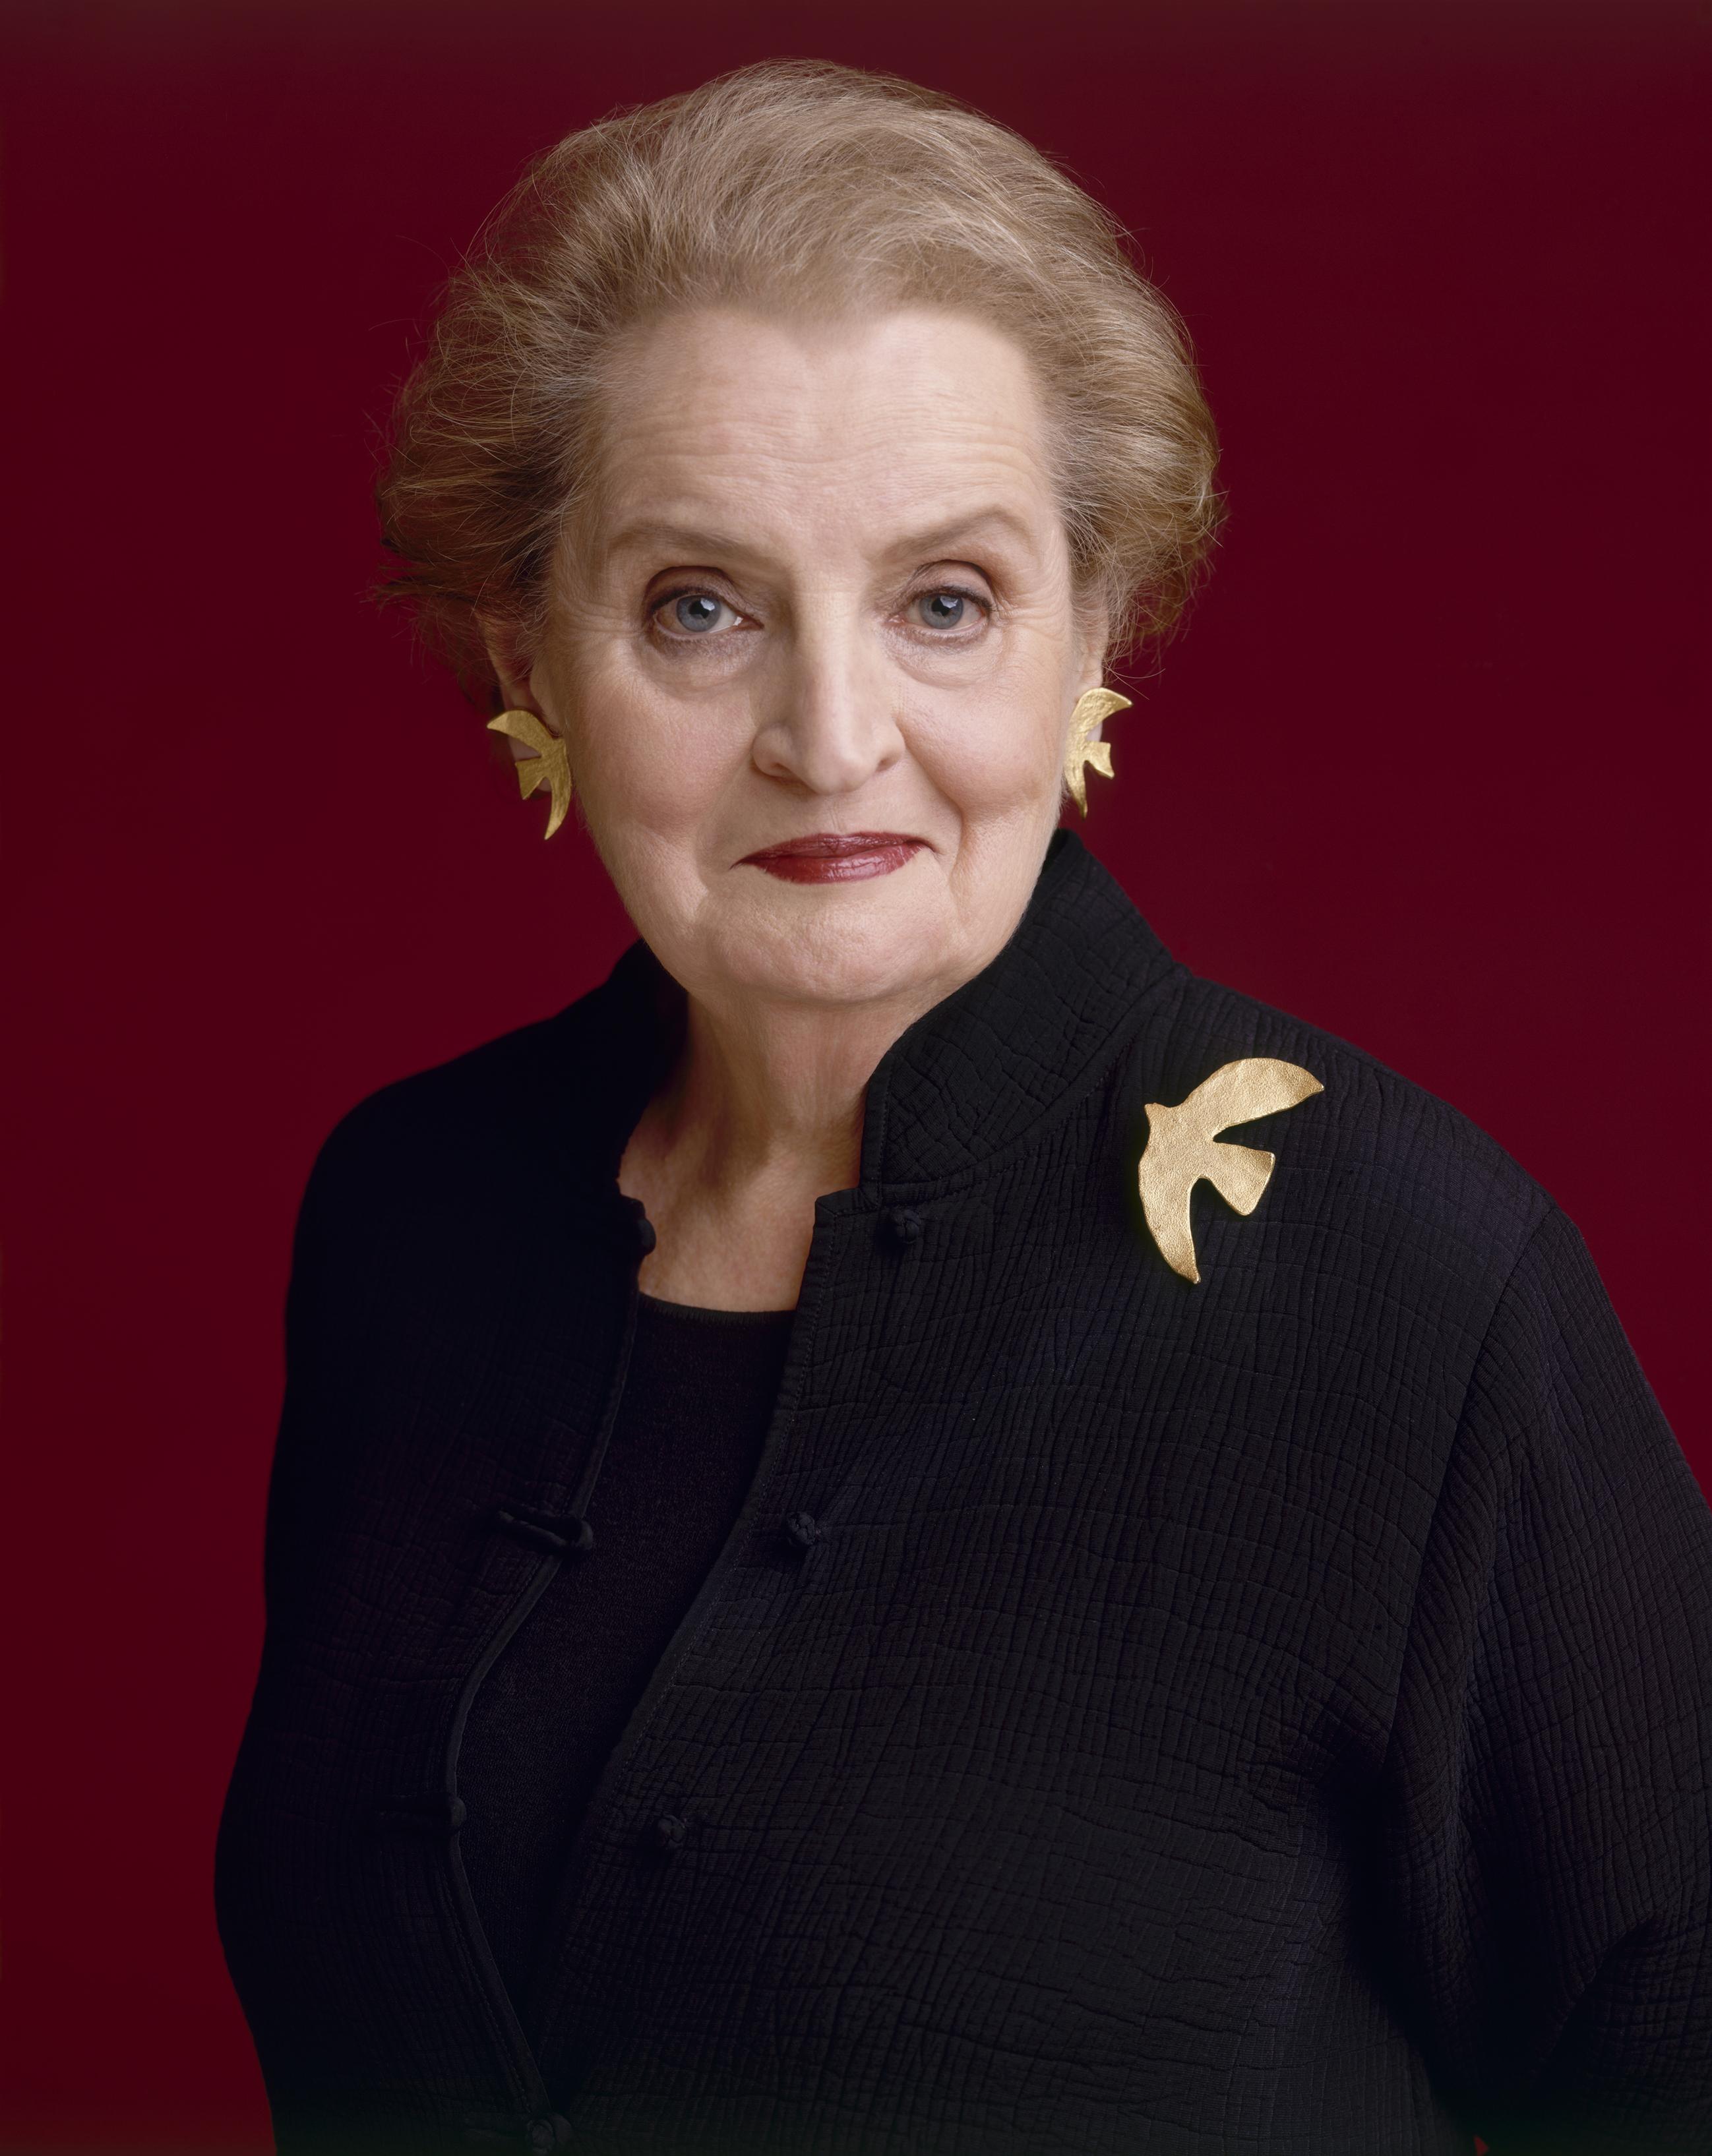 Madeleine_Albright_photo_credit_Timothy_Greenfield-Sanders.jpg